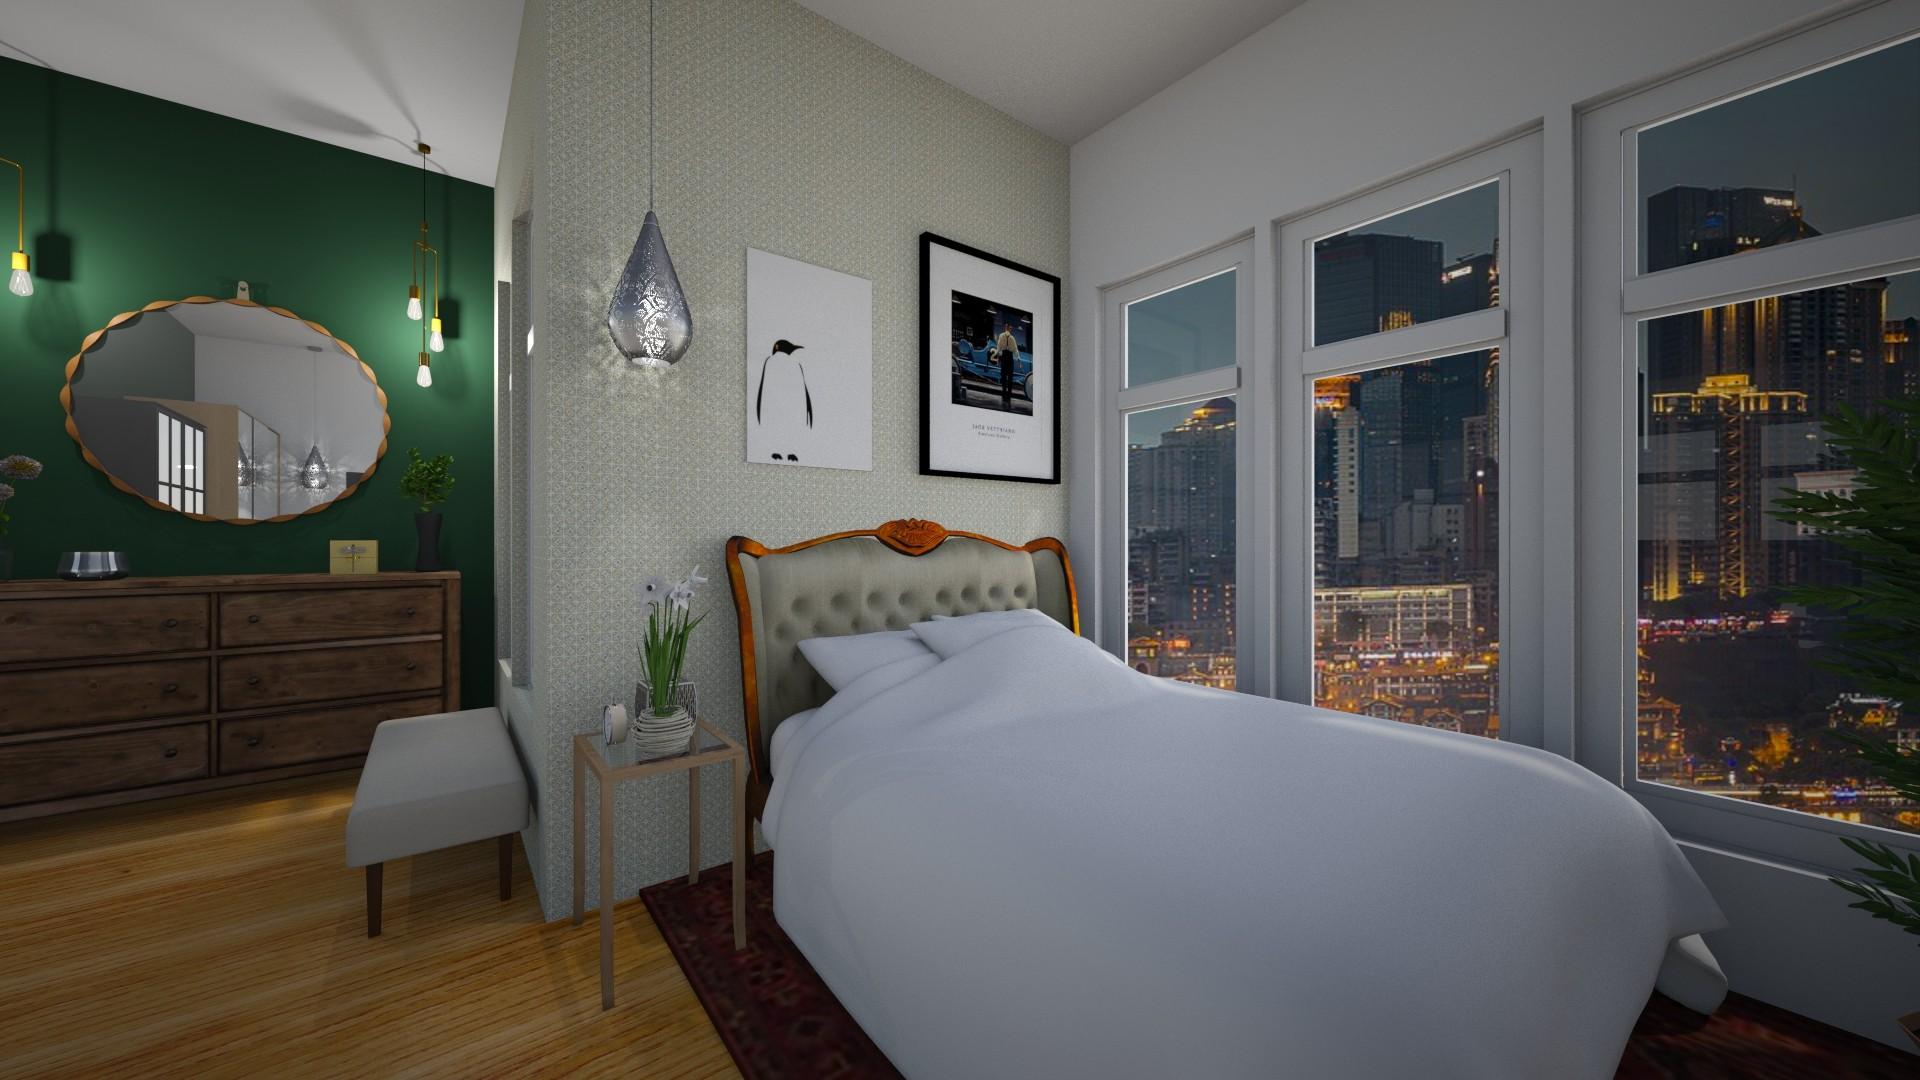 nnnn - Bedroom - by ljubitelj